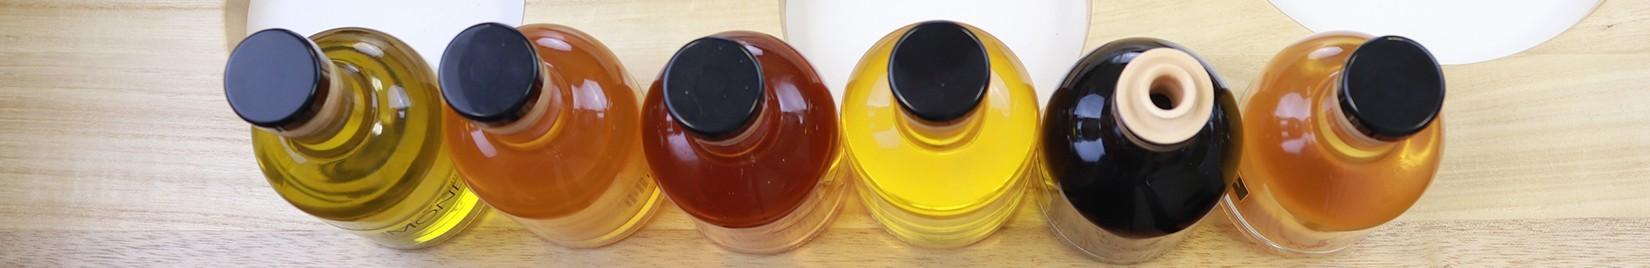 La sélection de condiments de Negozio Leggero